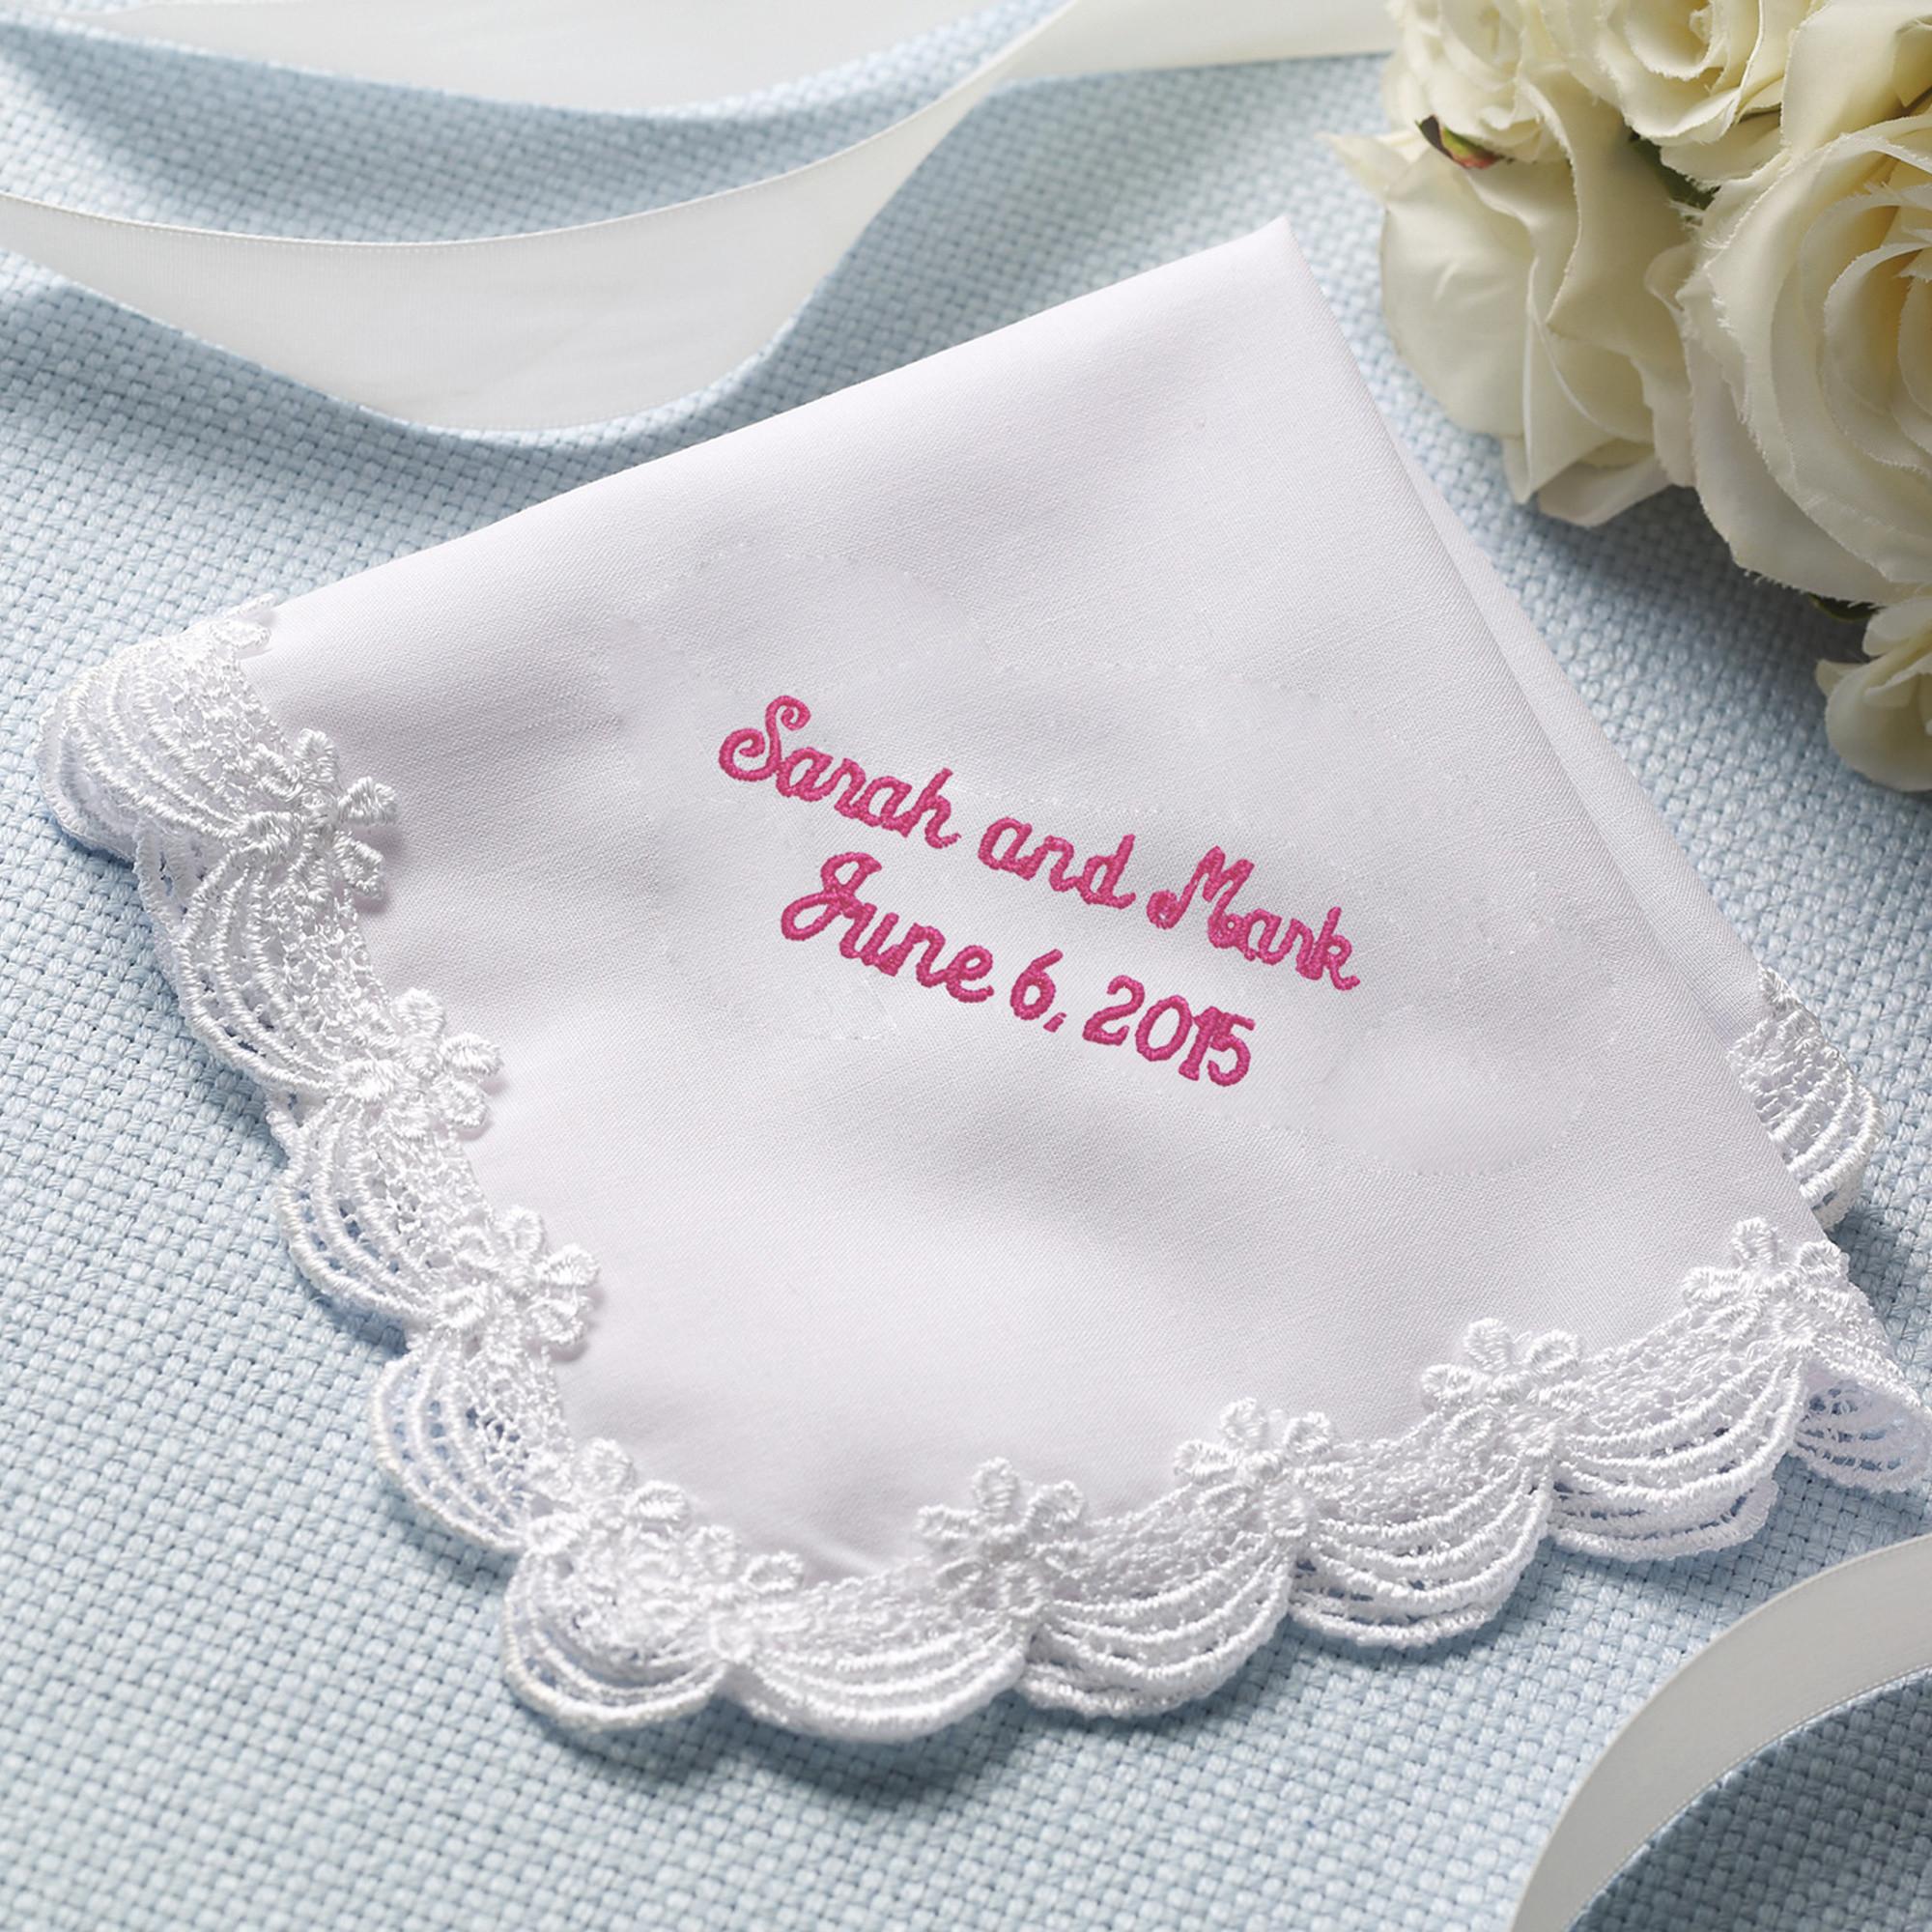 Wedding Wedding Handkerchief embroidered scalloped lace wedding handkerchief for bridesmaids bridesmaid gifts